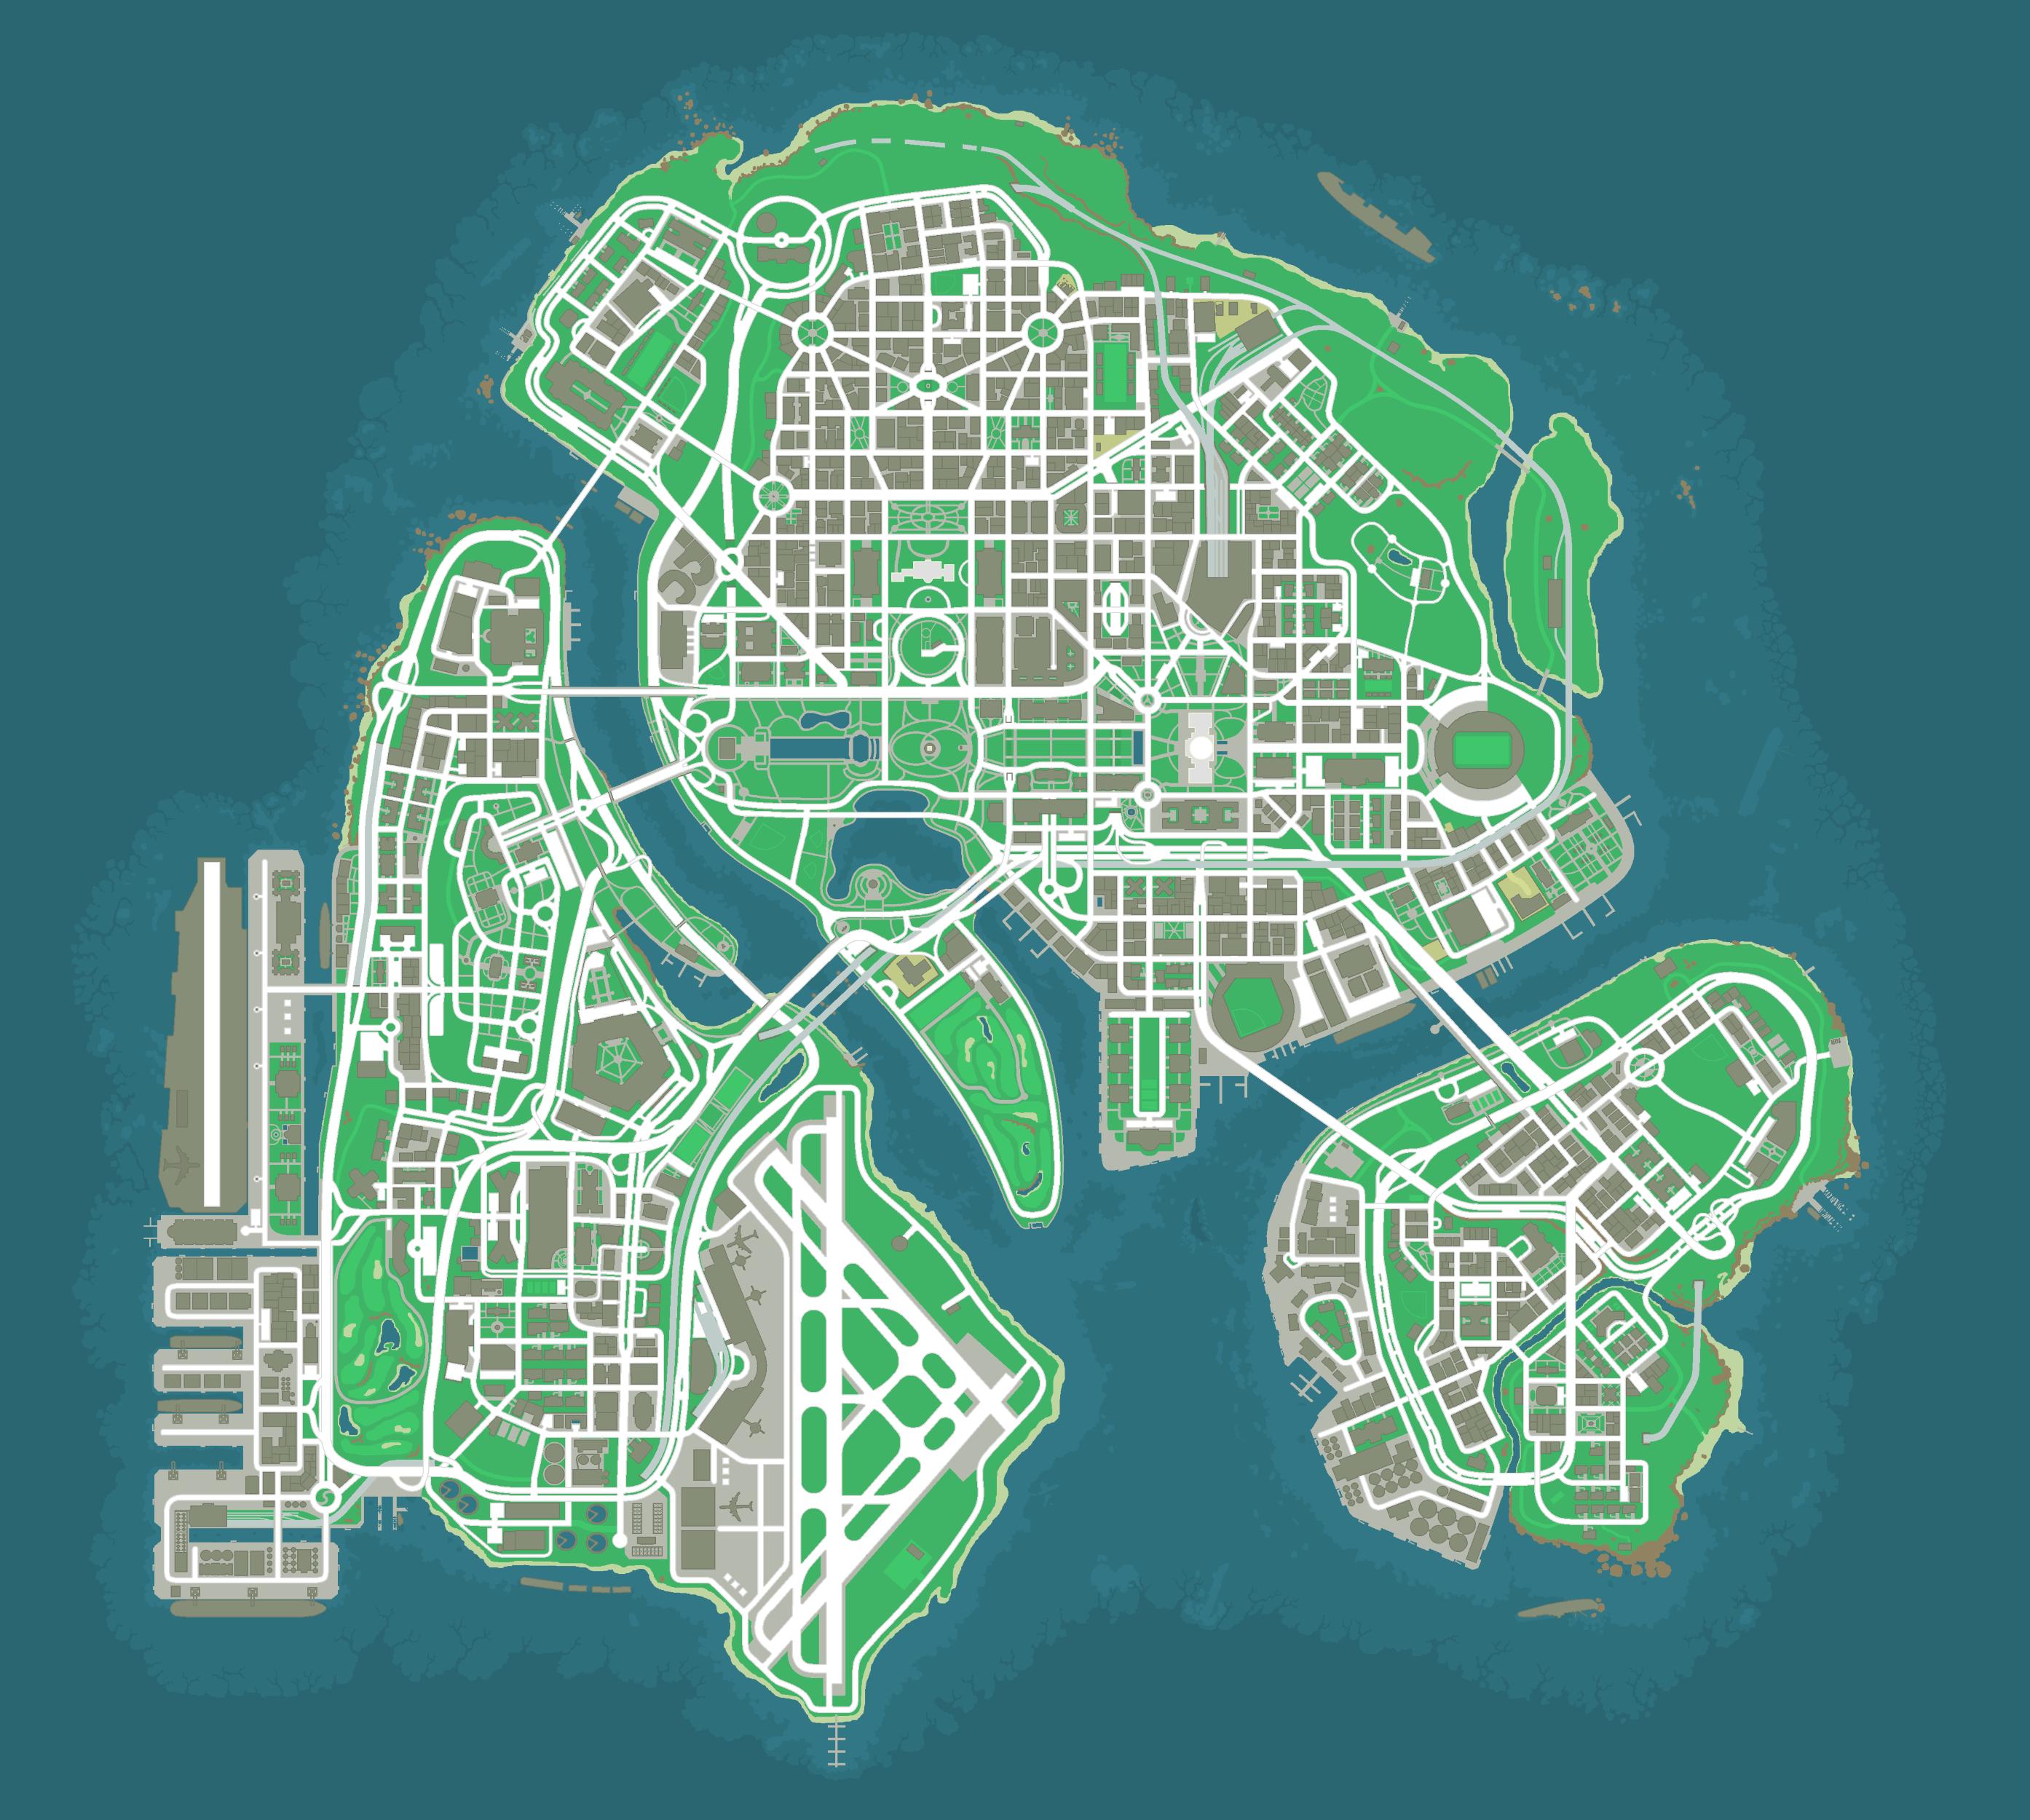 gta_capital_city_map_by_maniac_deadite-d